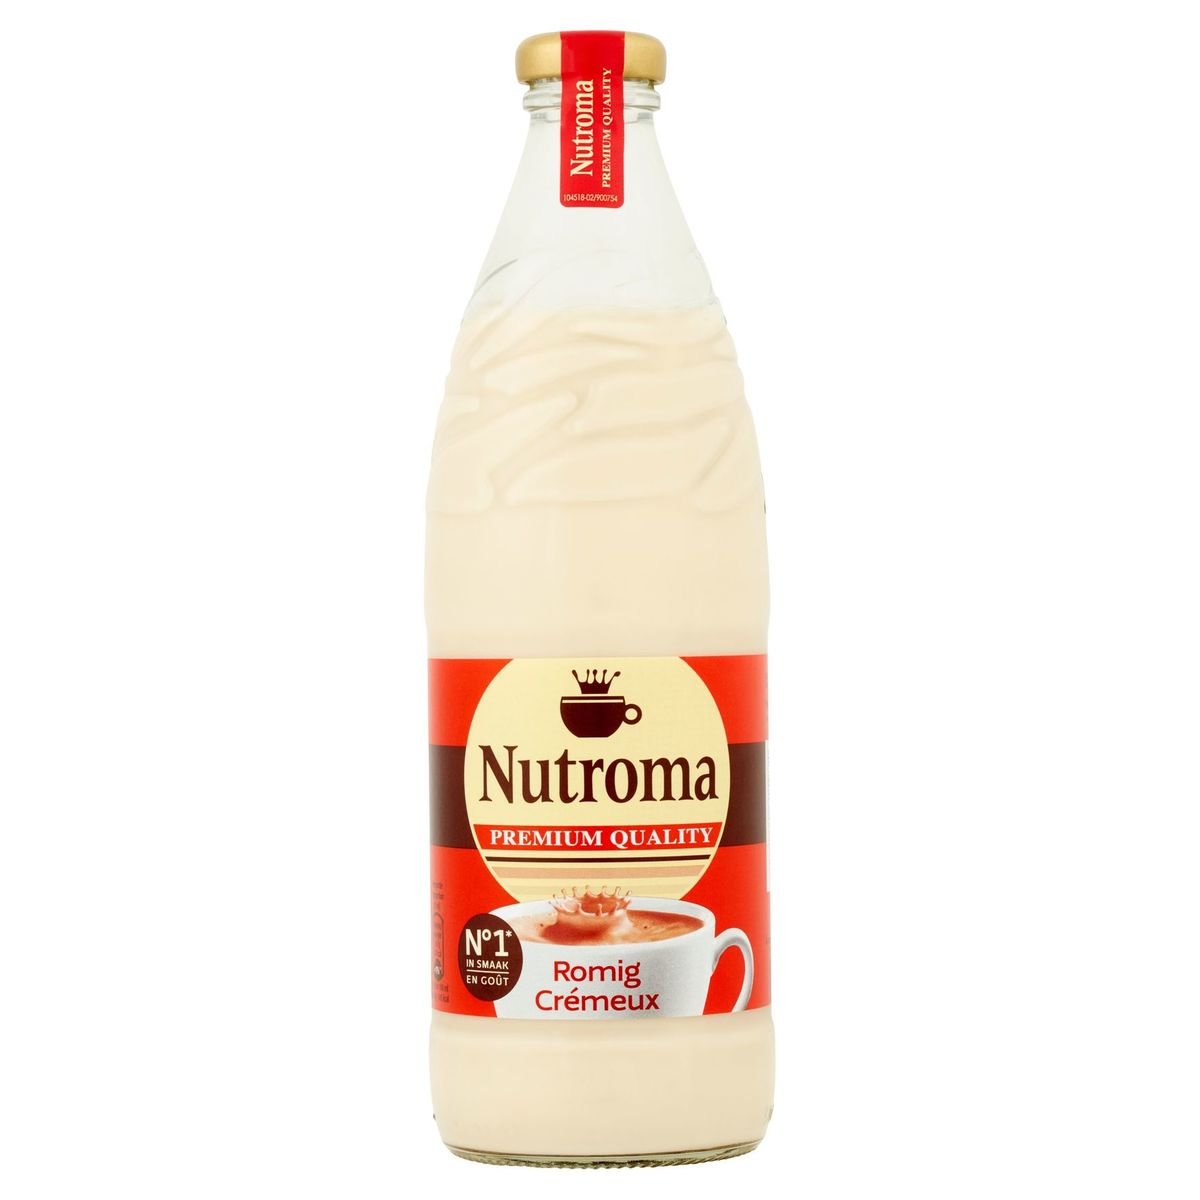 Nutroma Premium Quality Crémeux 500 ml